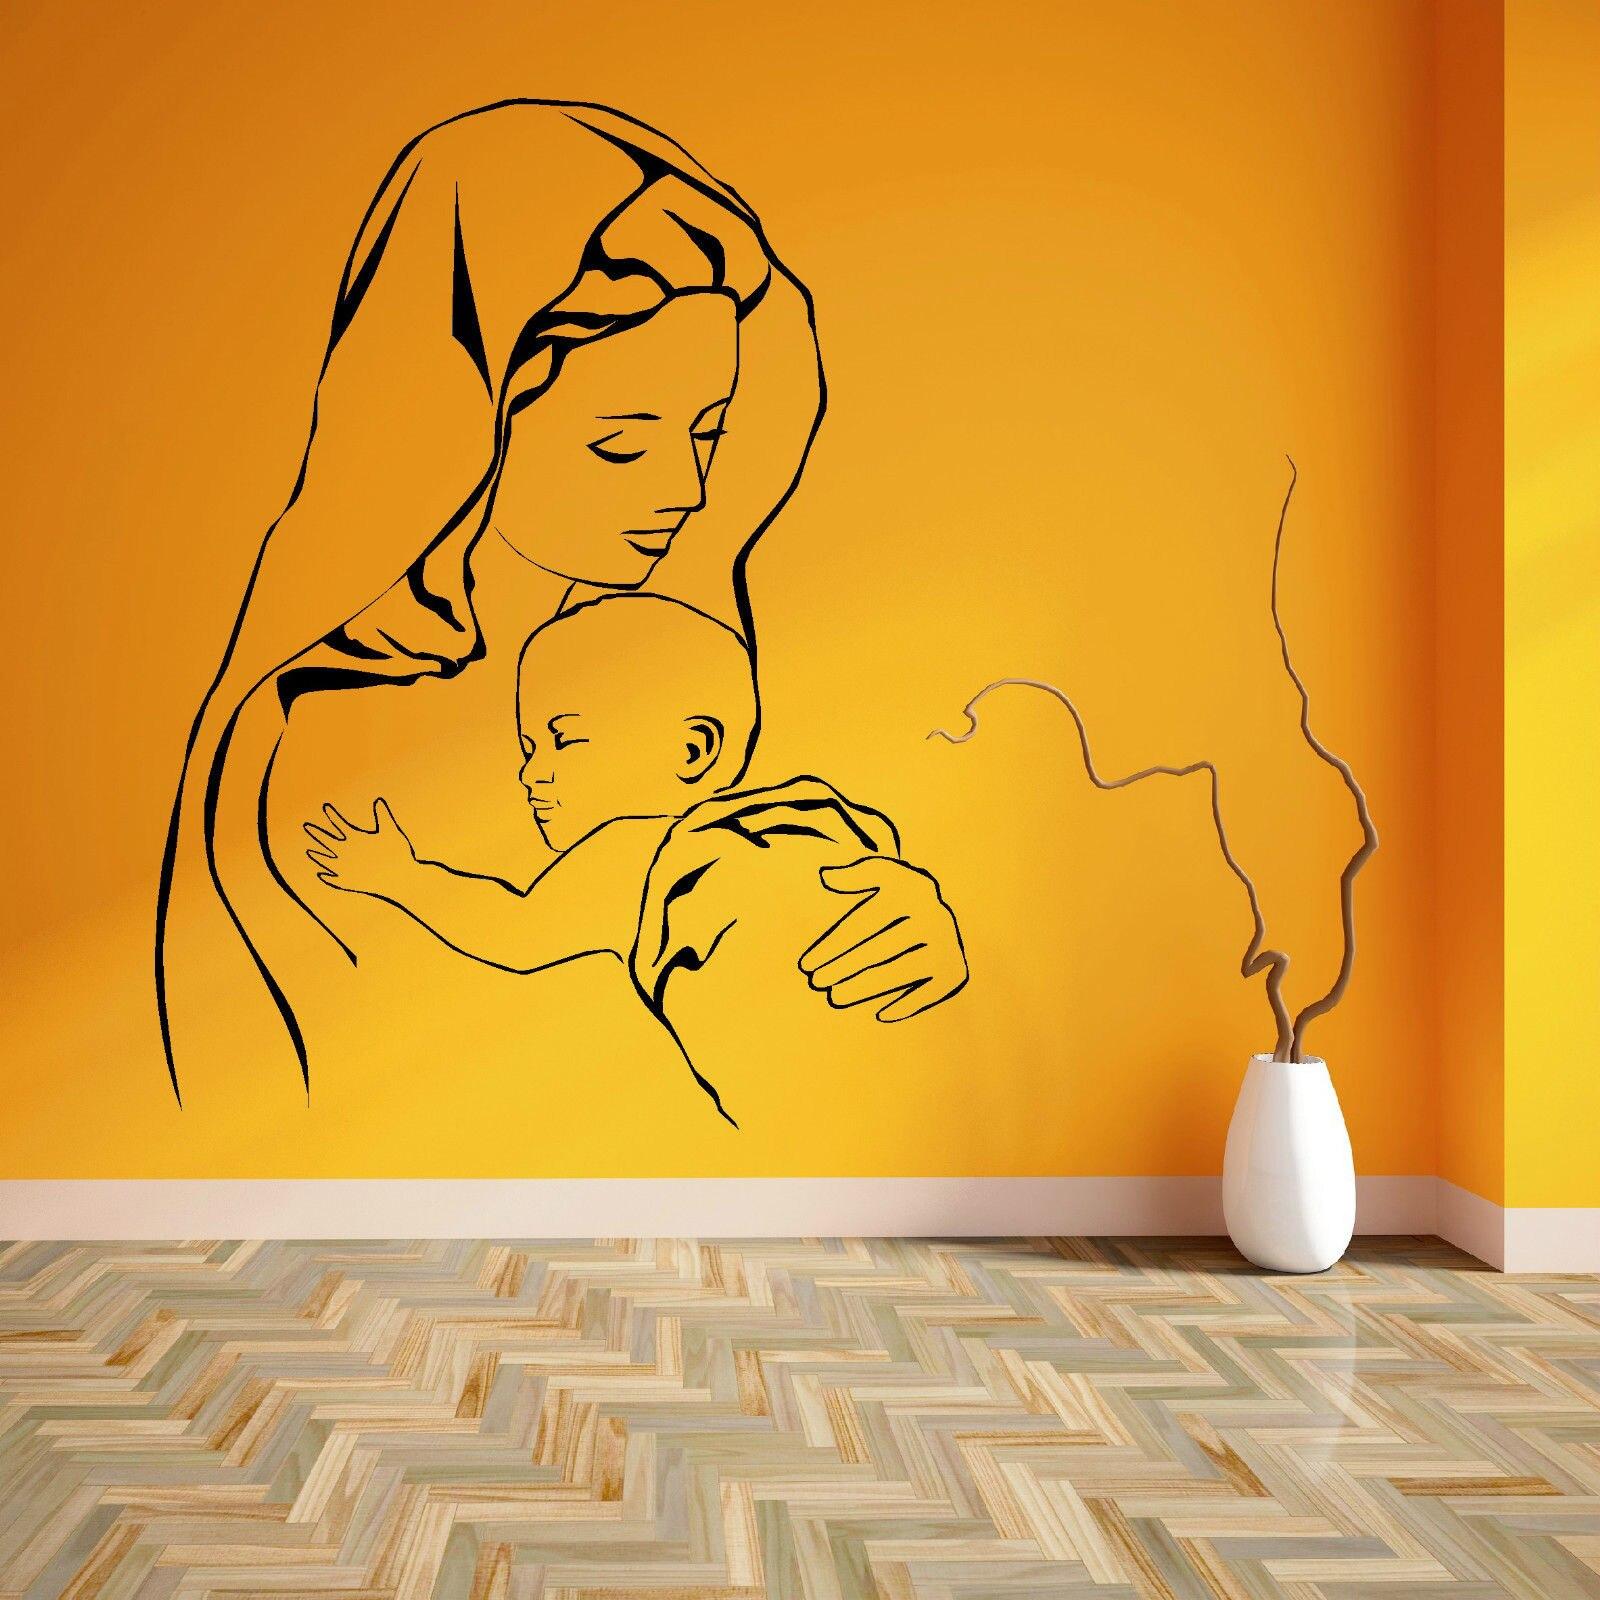 Jesus Wall Art popular jesus children art-buy cheap jesus children art lots from